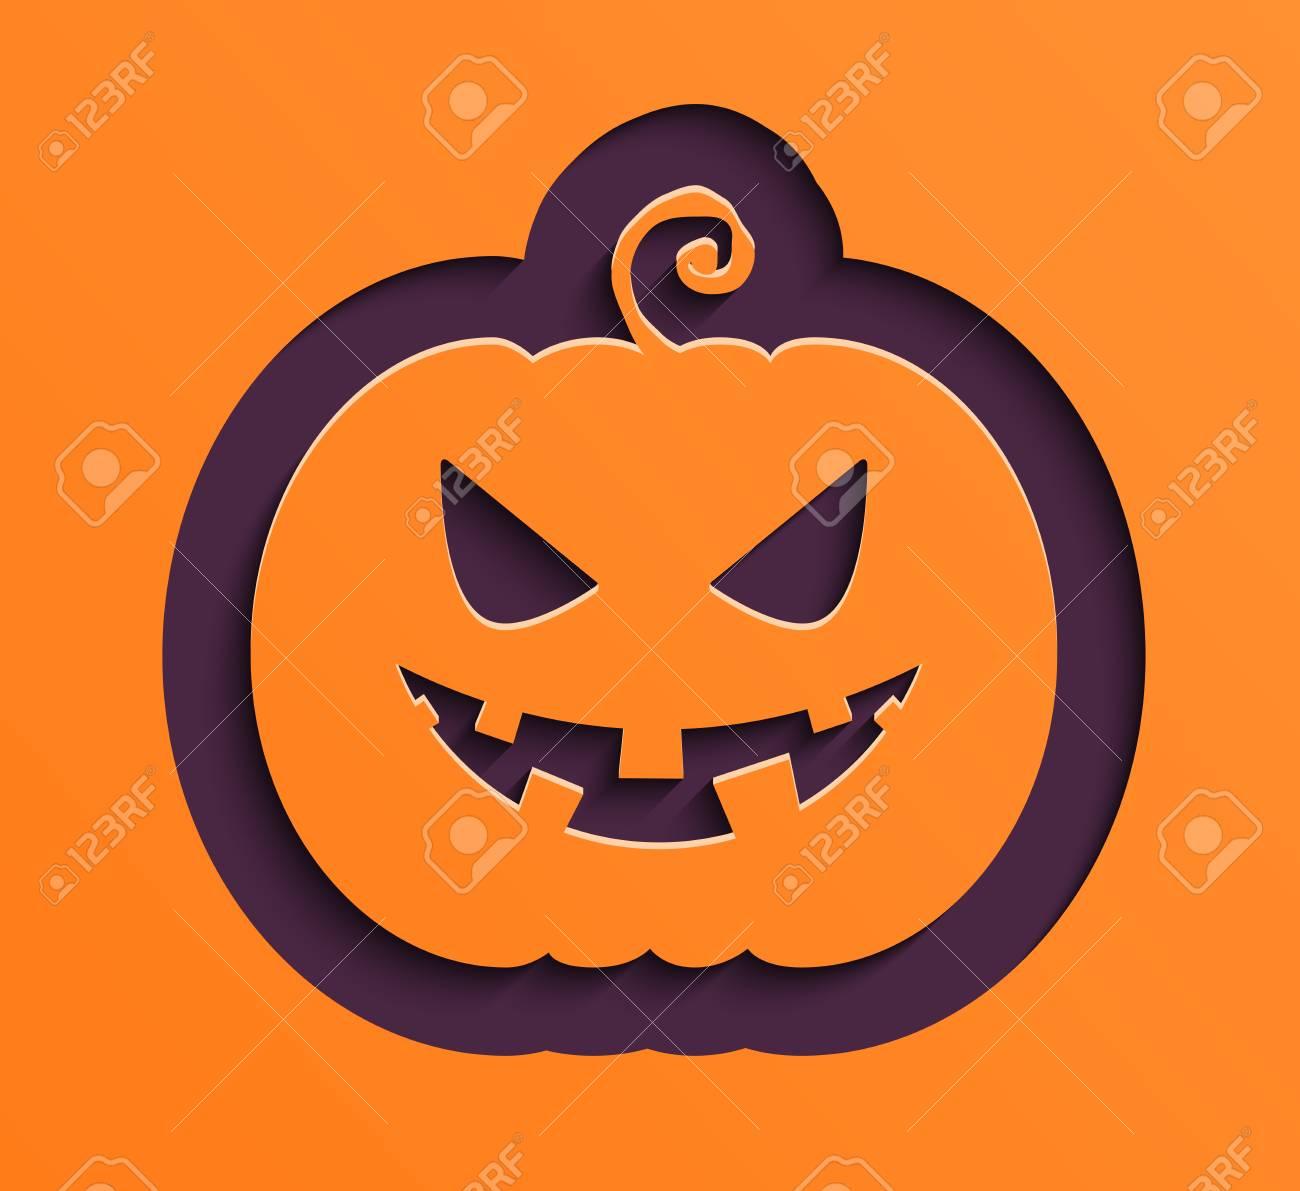 Feliz Calabaza De Papel De Halloween Ilustracion Ilustraciones - Calabaza-de-papel